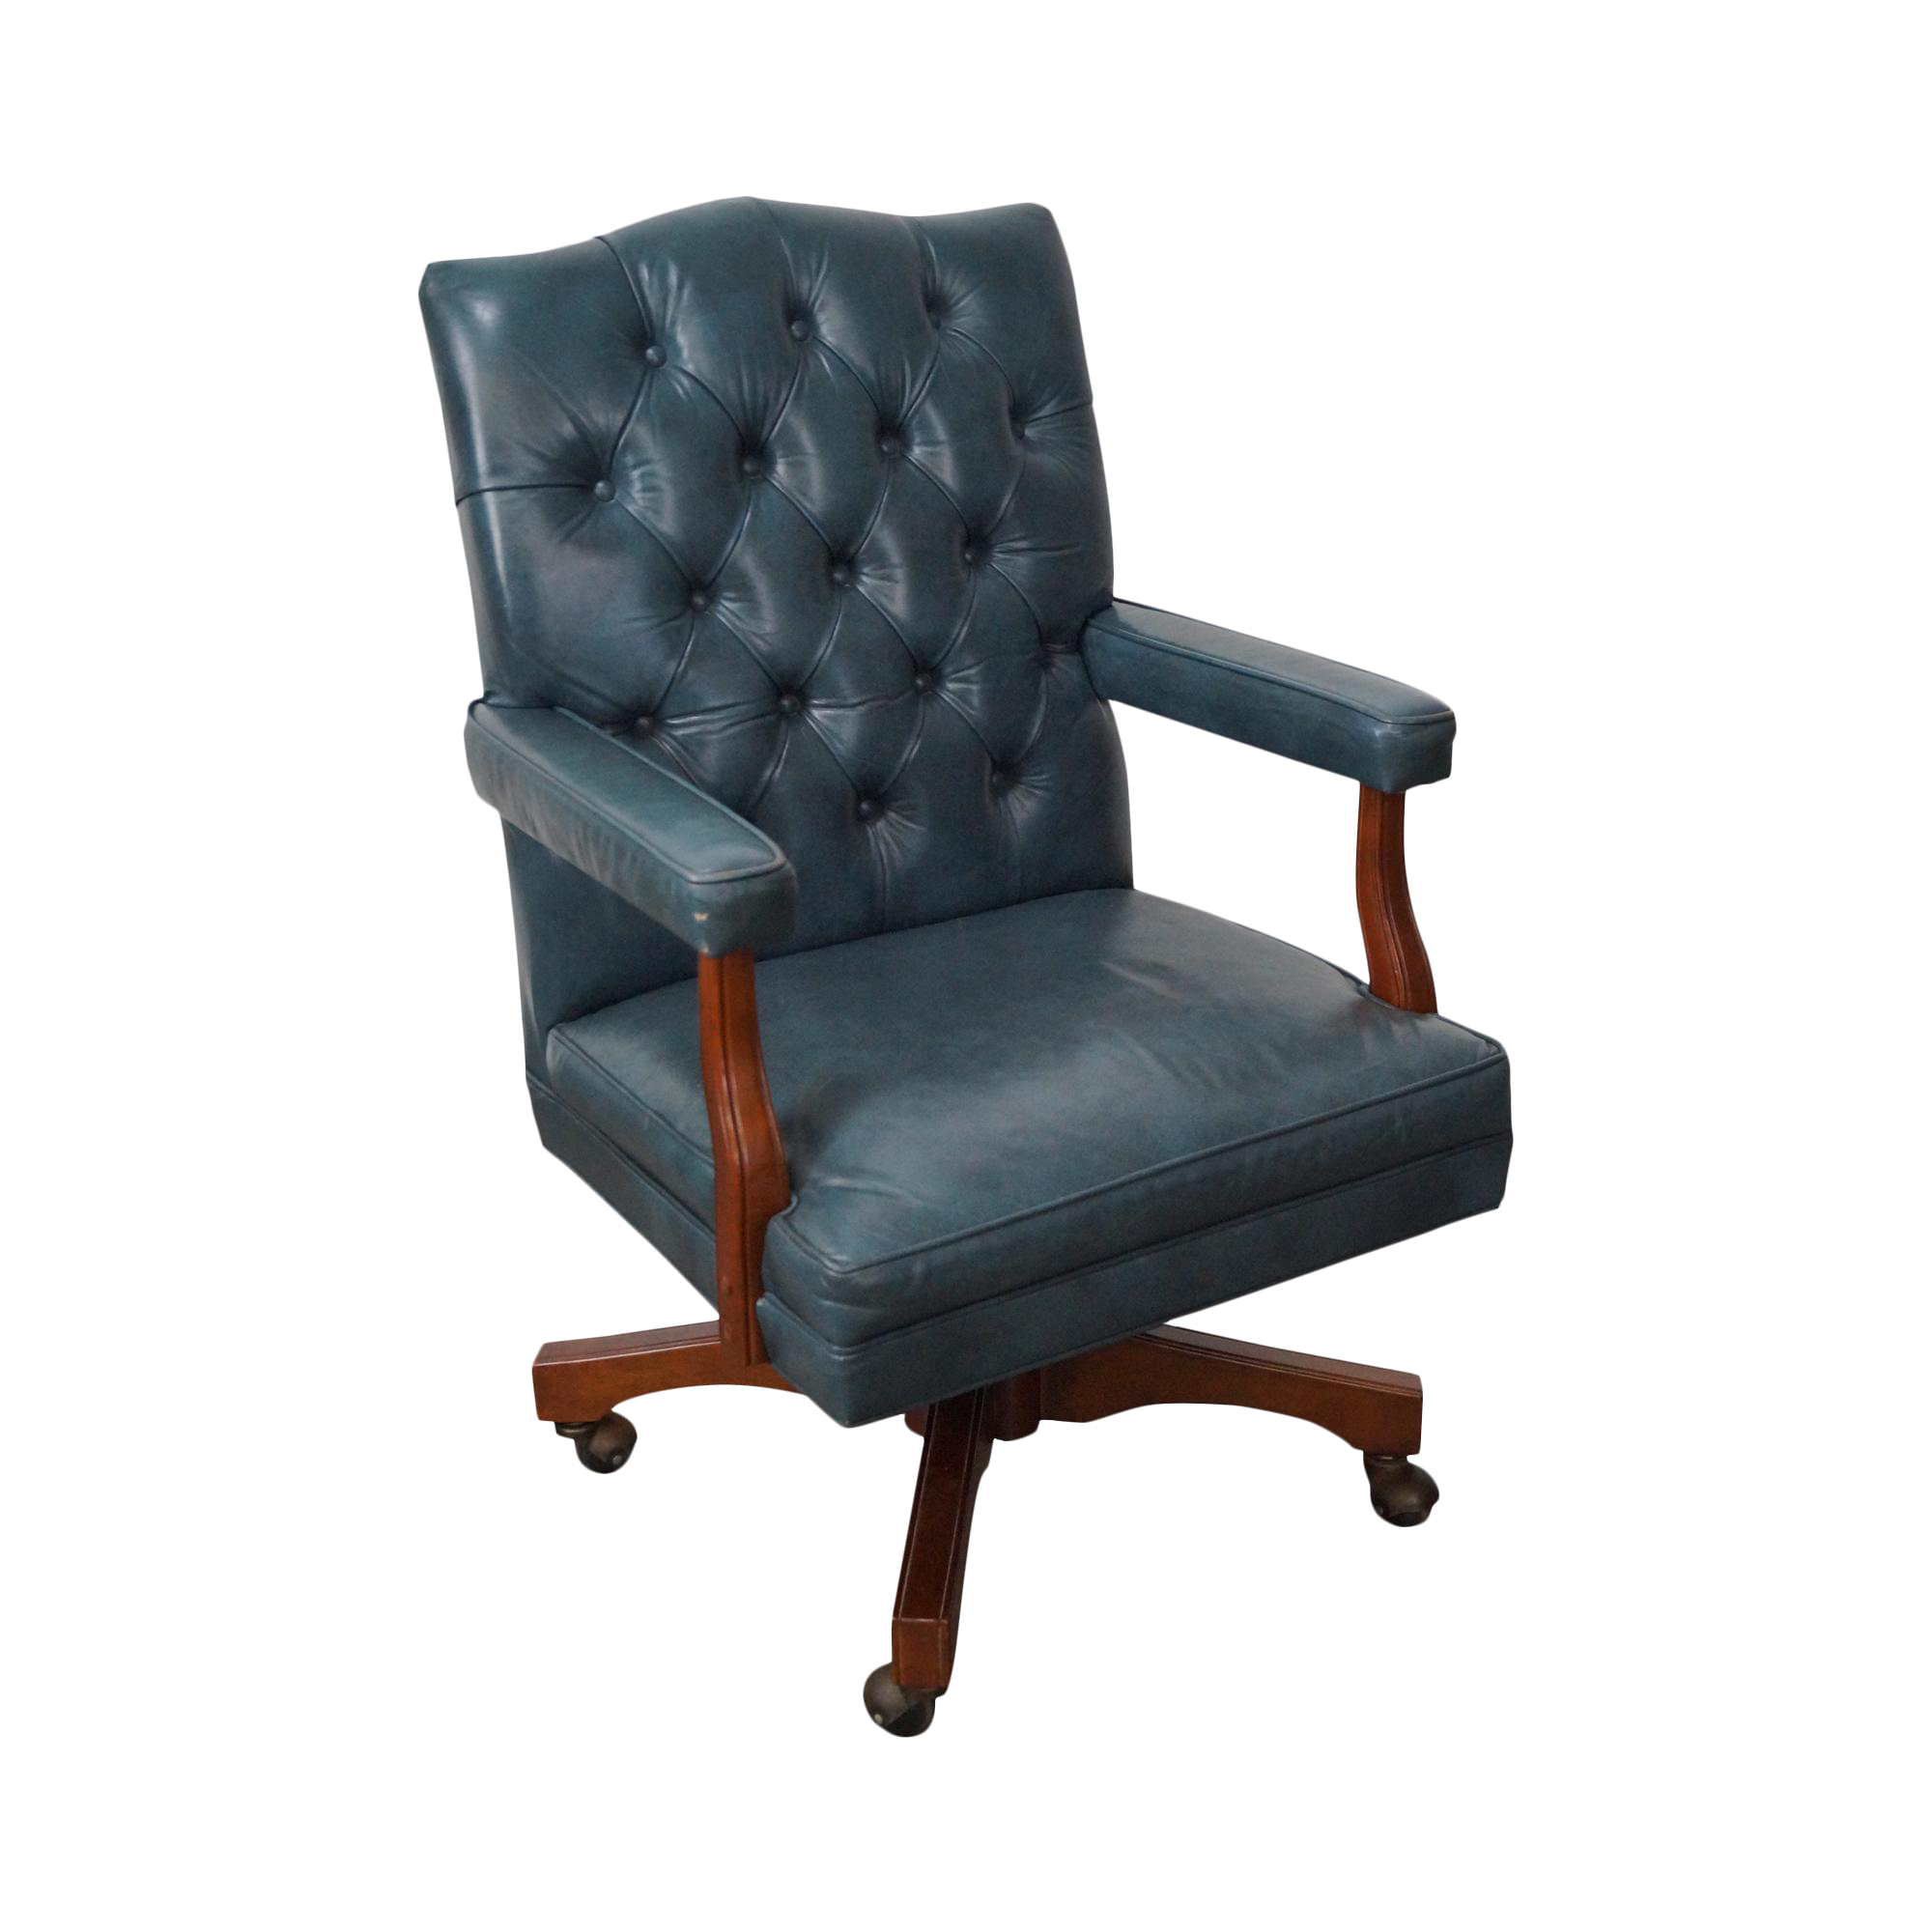 Superb Vintage Blue Tufted Leather Executive Desk Chair